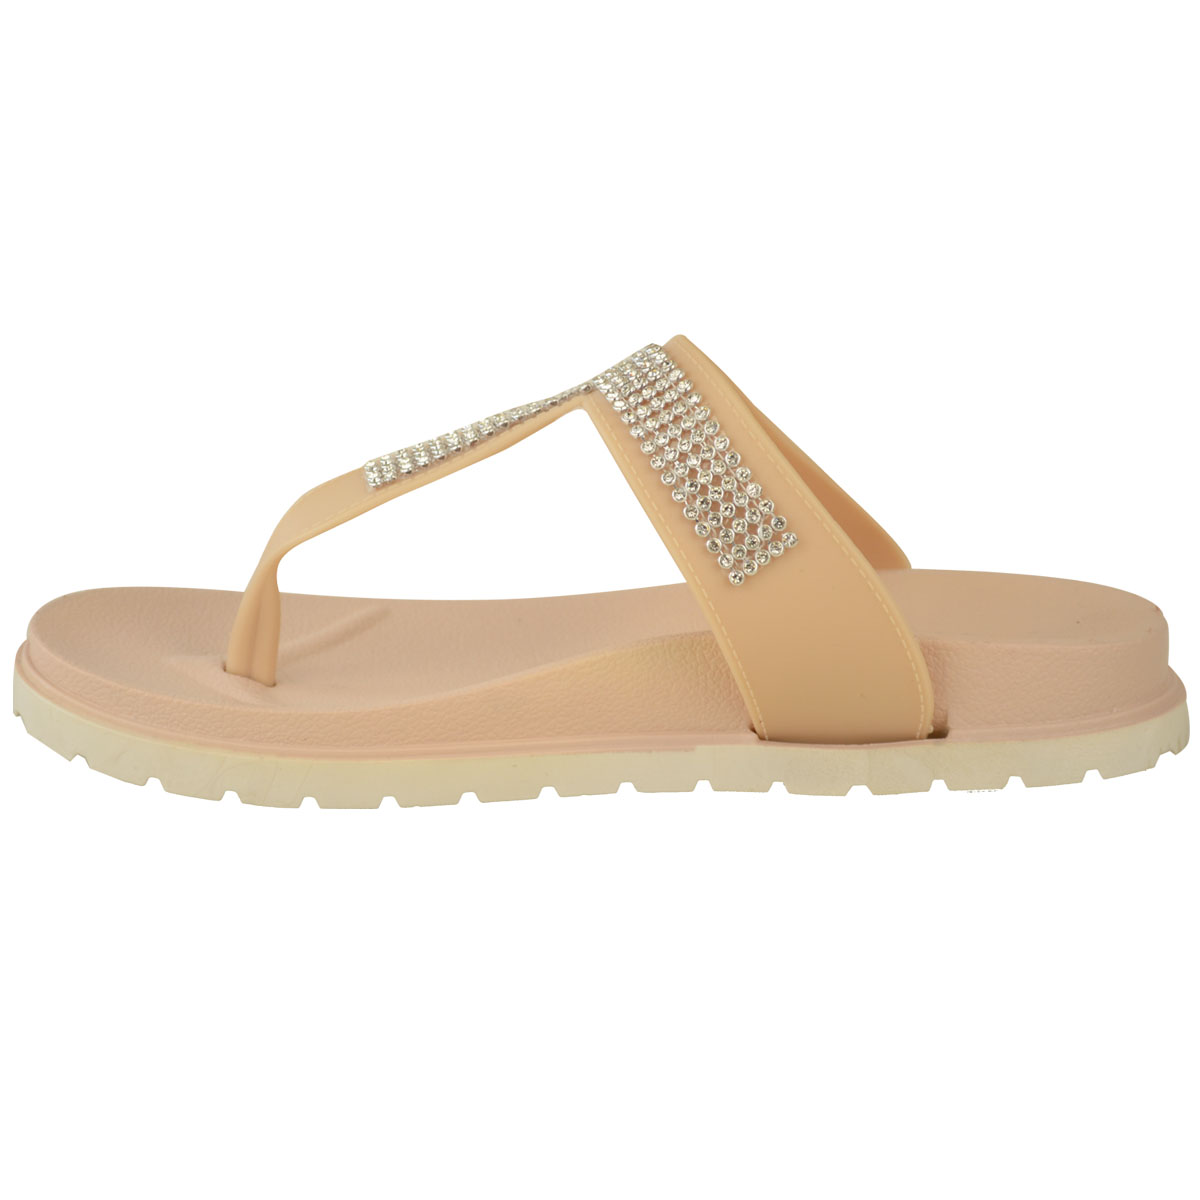 Ladies Womens Beach Summer Sliders Diamante Jelly Flip Flop Sandals Shoes Size